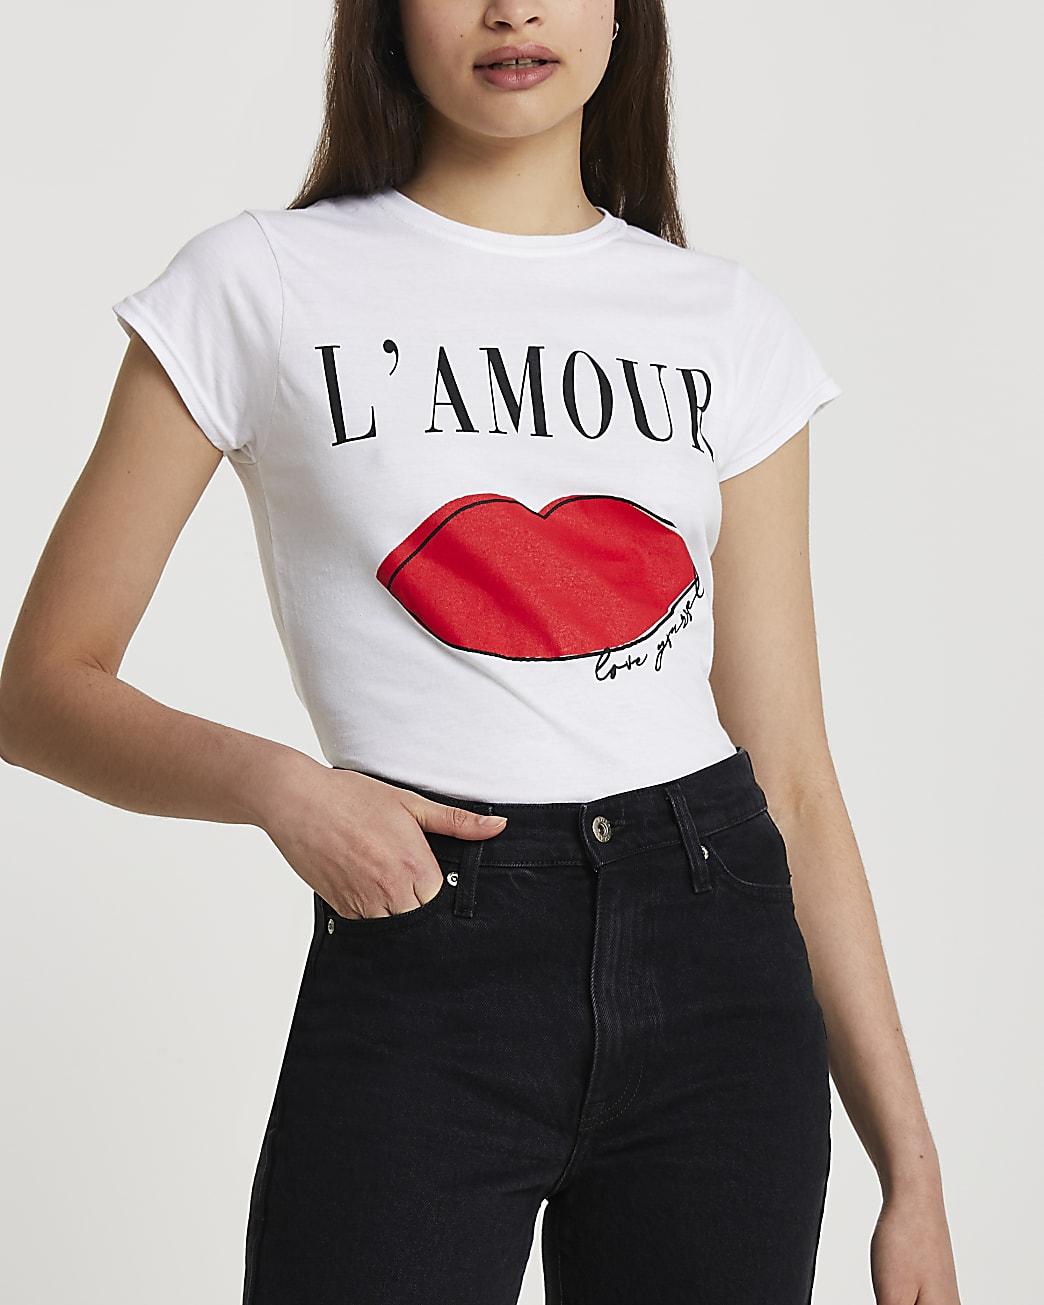 White short sleeve L'amour t-shirt